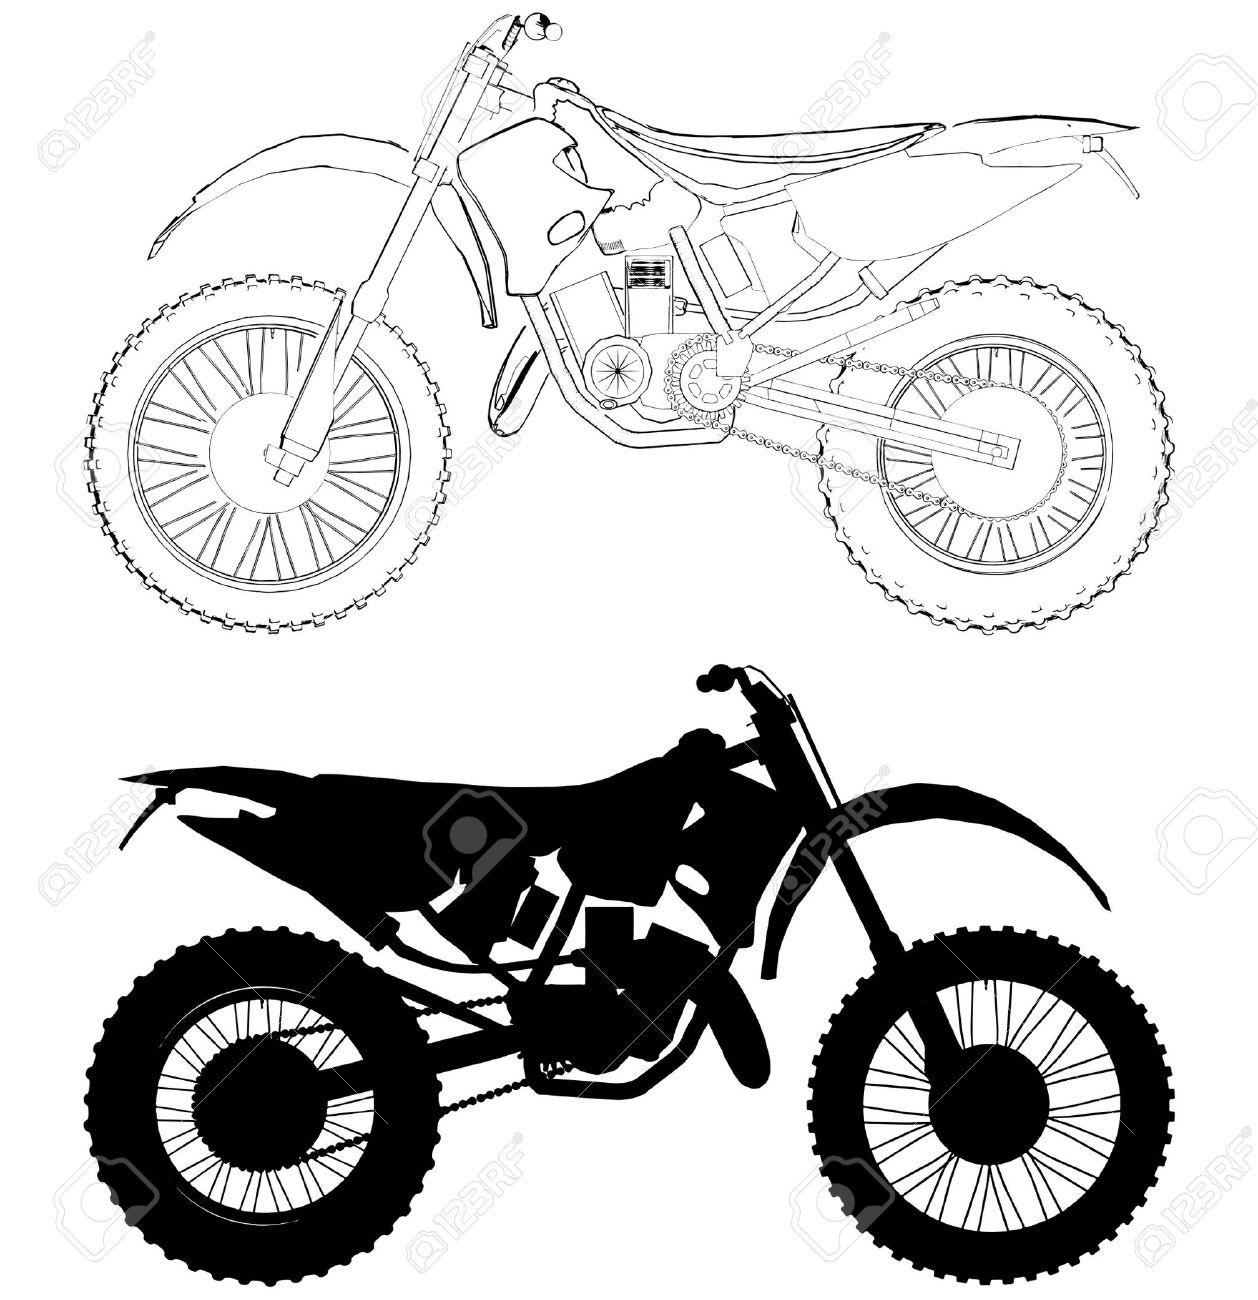 Dirt bike helmet drawing at getdrawings free for personal use